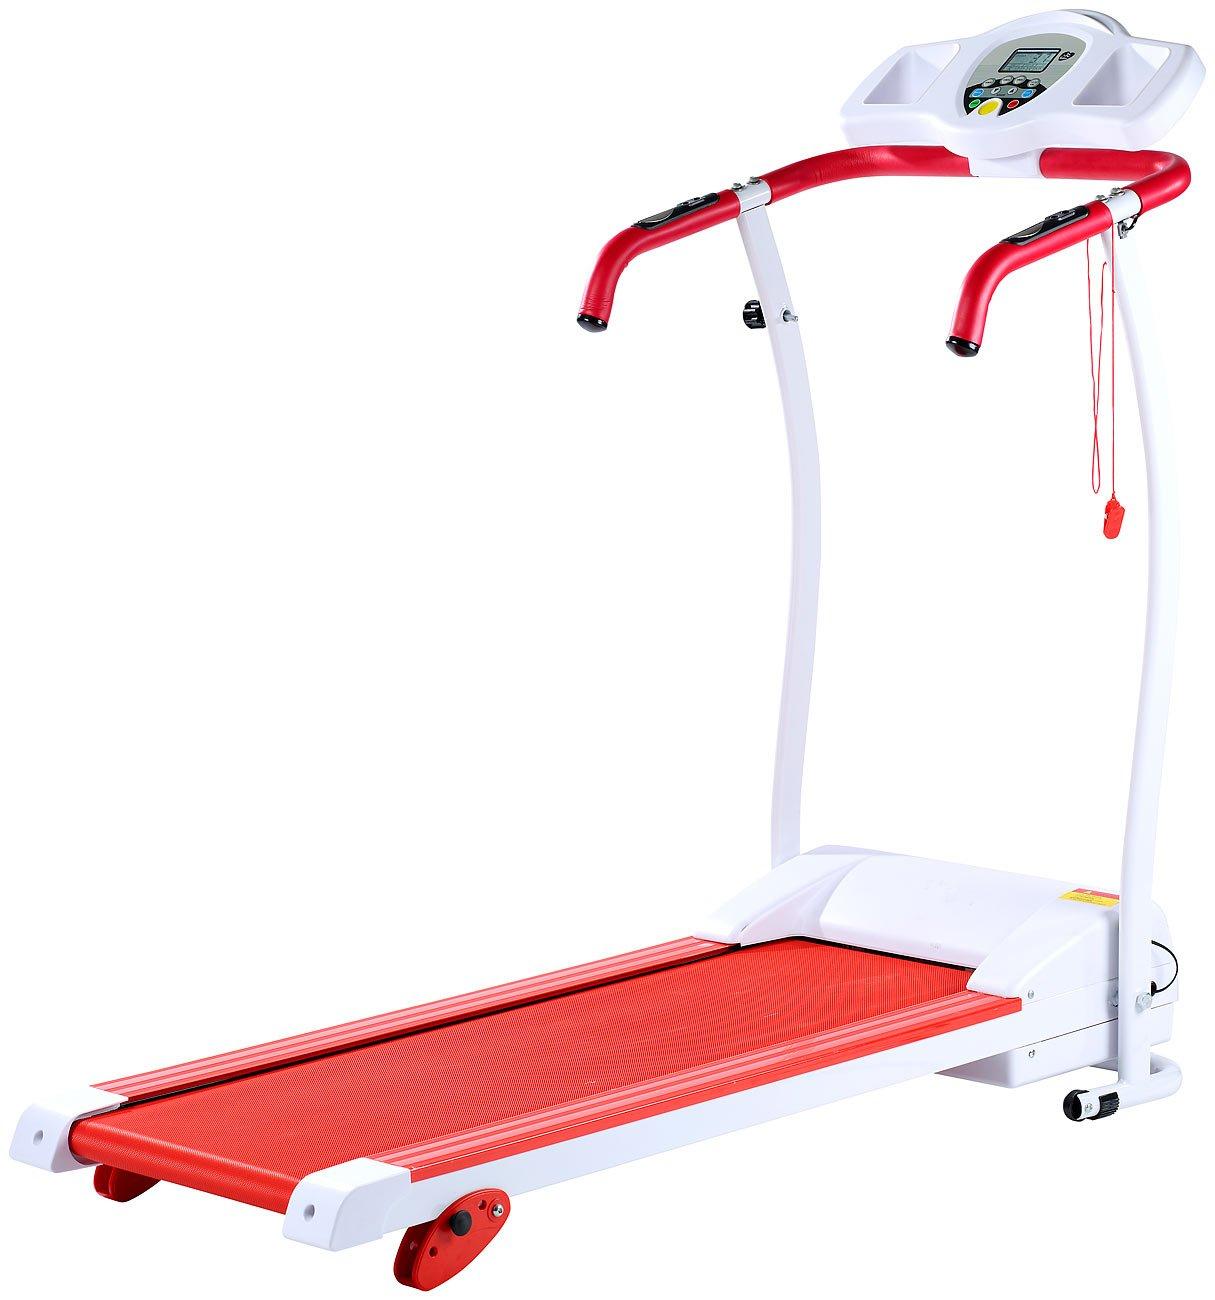 12 Programme Steigung bis 120 kg Newgen Medicals Treadmill: Premium-Laufband Laufband Heimtrainer 12 km//h 1,5 PS